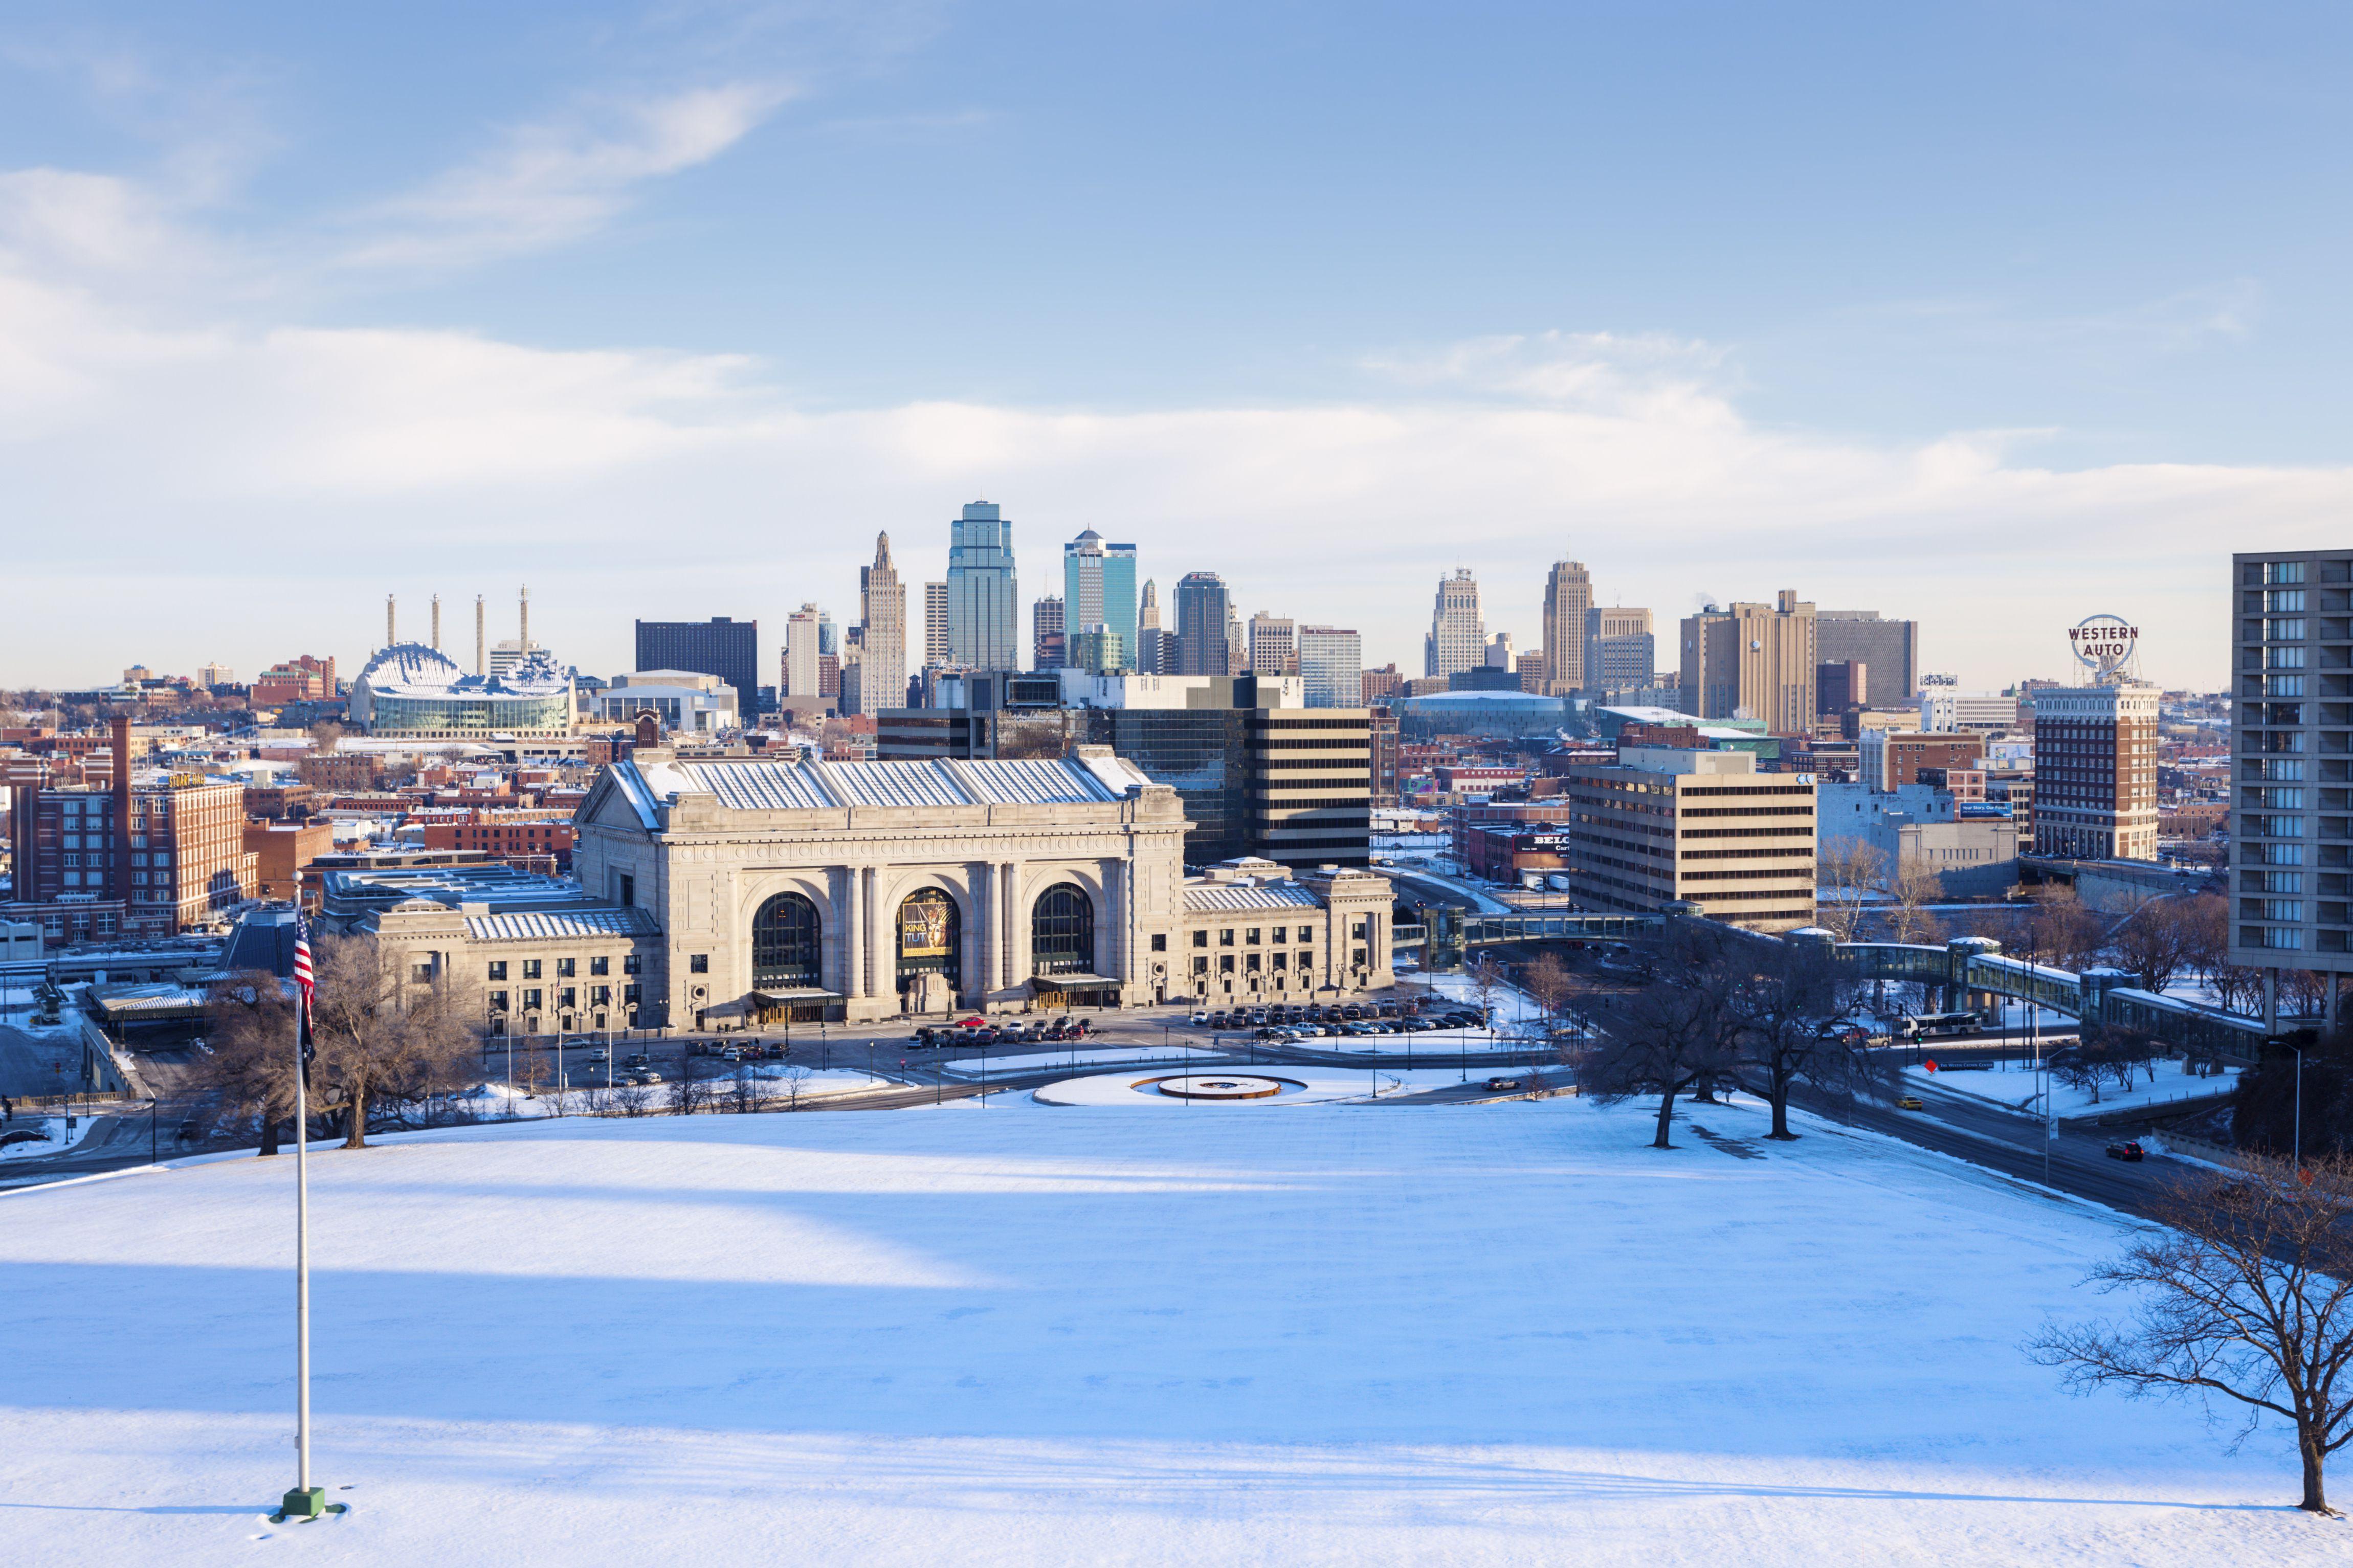 Kansas City Celebrates Christmas In The Park